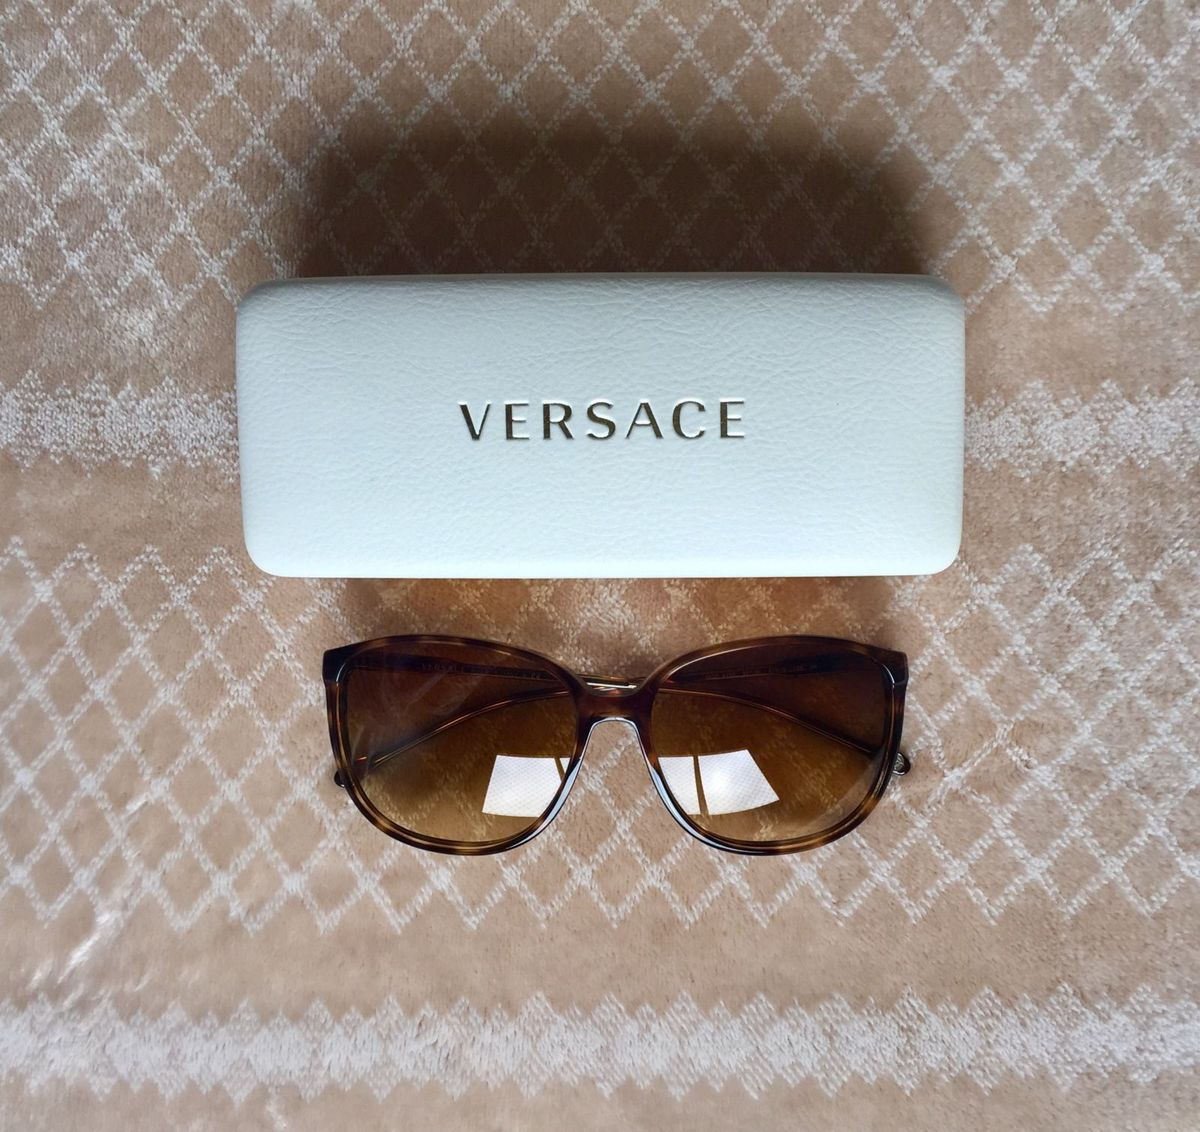 óculos versace gatinho - óculos versace.  Czm6ly9wag90b3muzw5qb2vplmnvbs5ici9wcm9kdwn0cy82nzy0otezlzjlm2jkzdiyzwy1mdhjytrlmgi4odvknjjmowmxnjq1lmpwzw  ... 91965ca56a